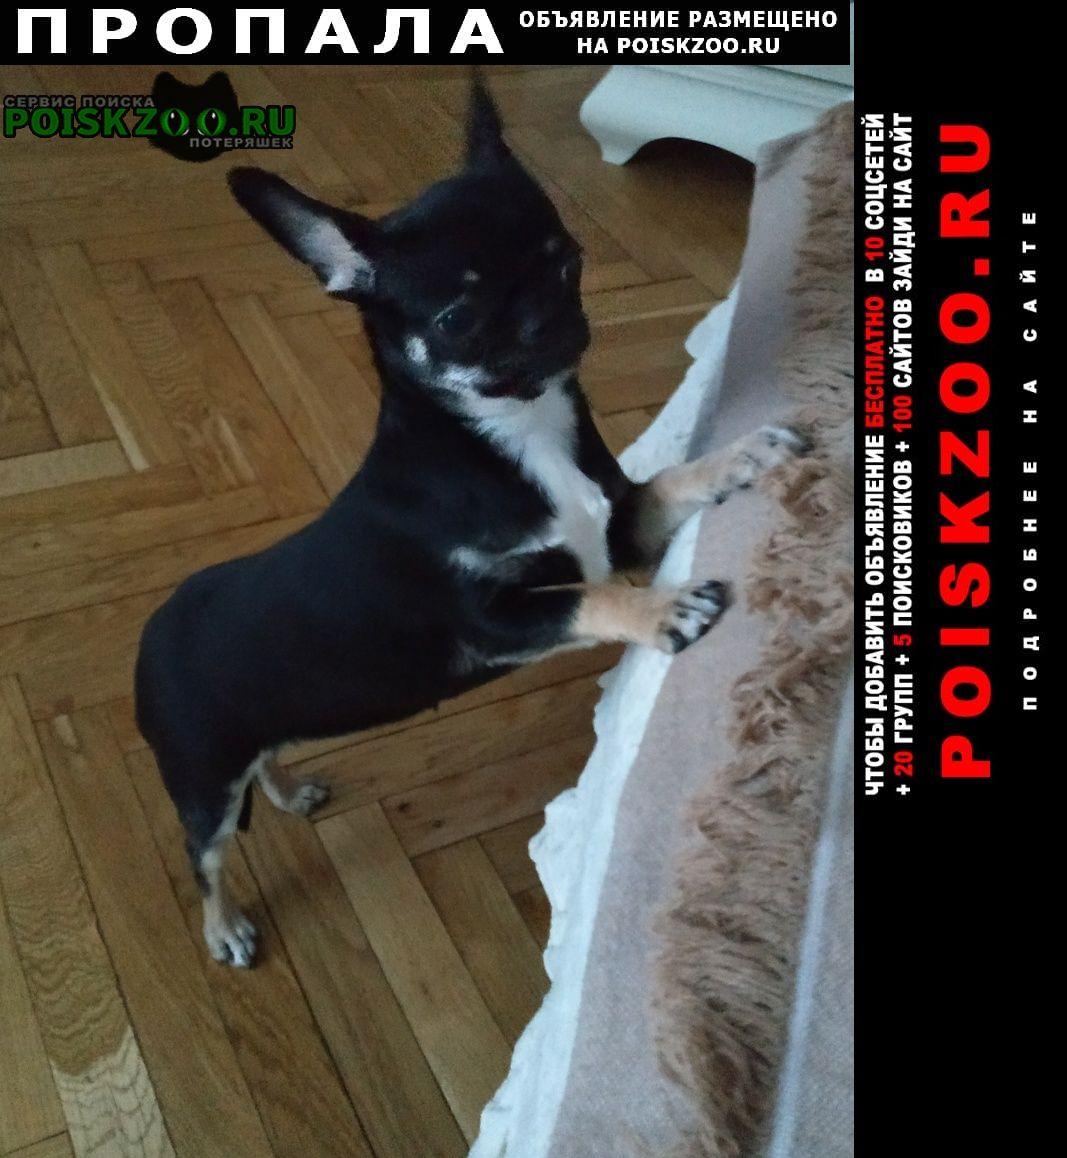 Пропала собака чиахуа Москва